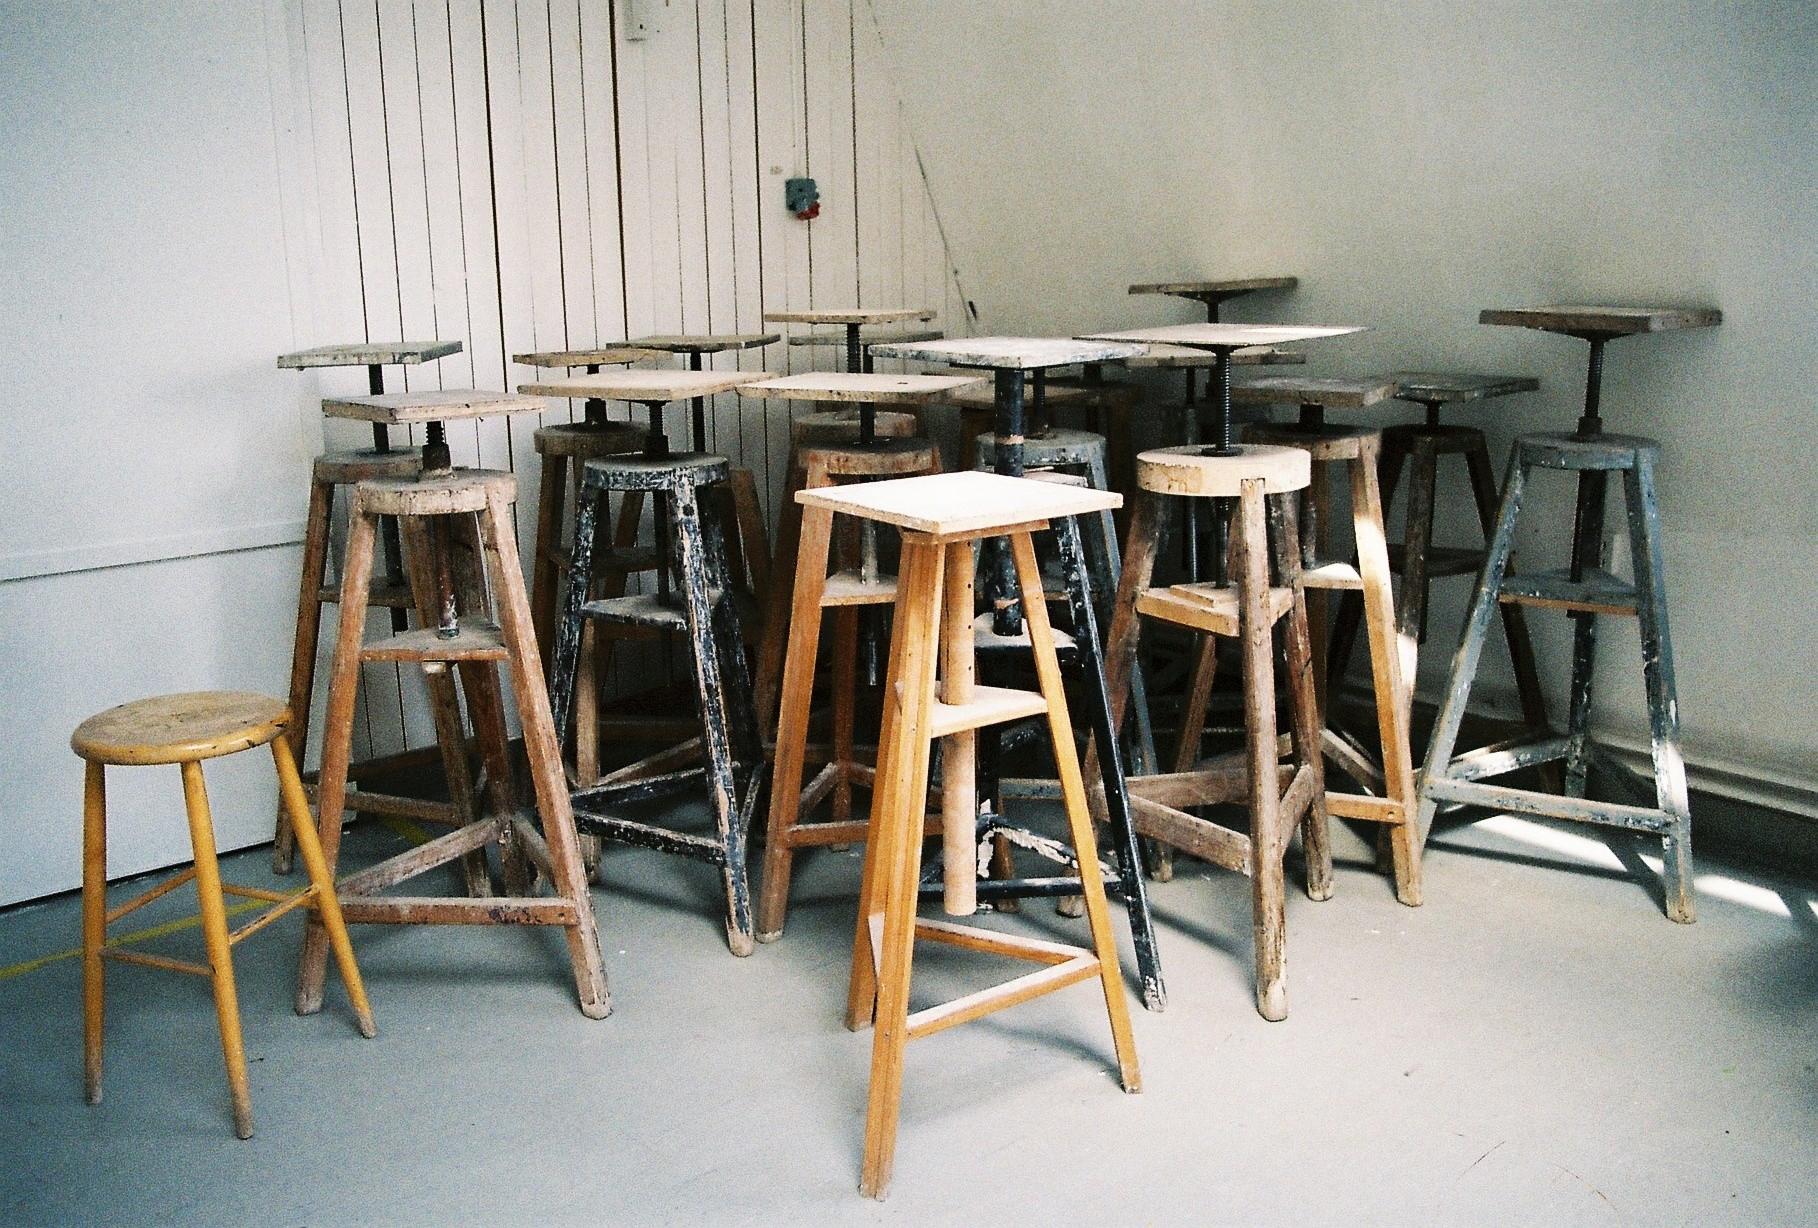 Chairs. Art school